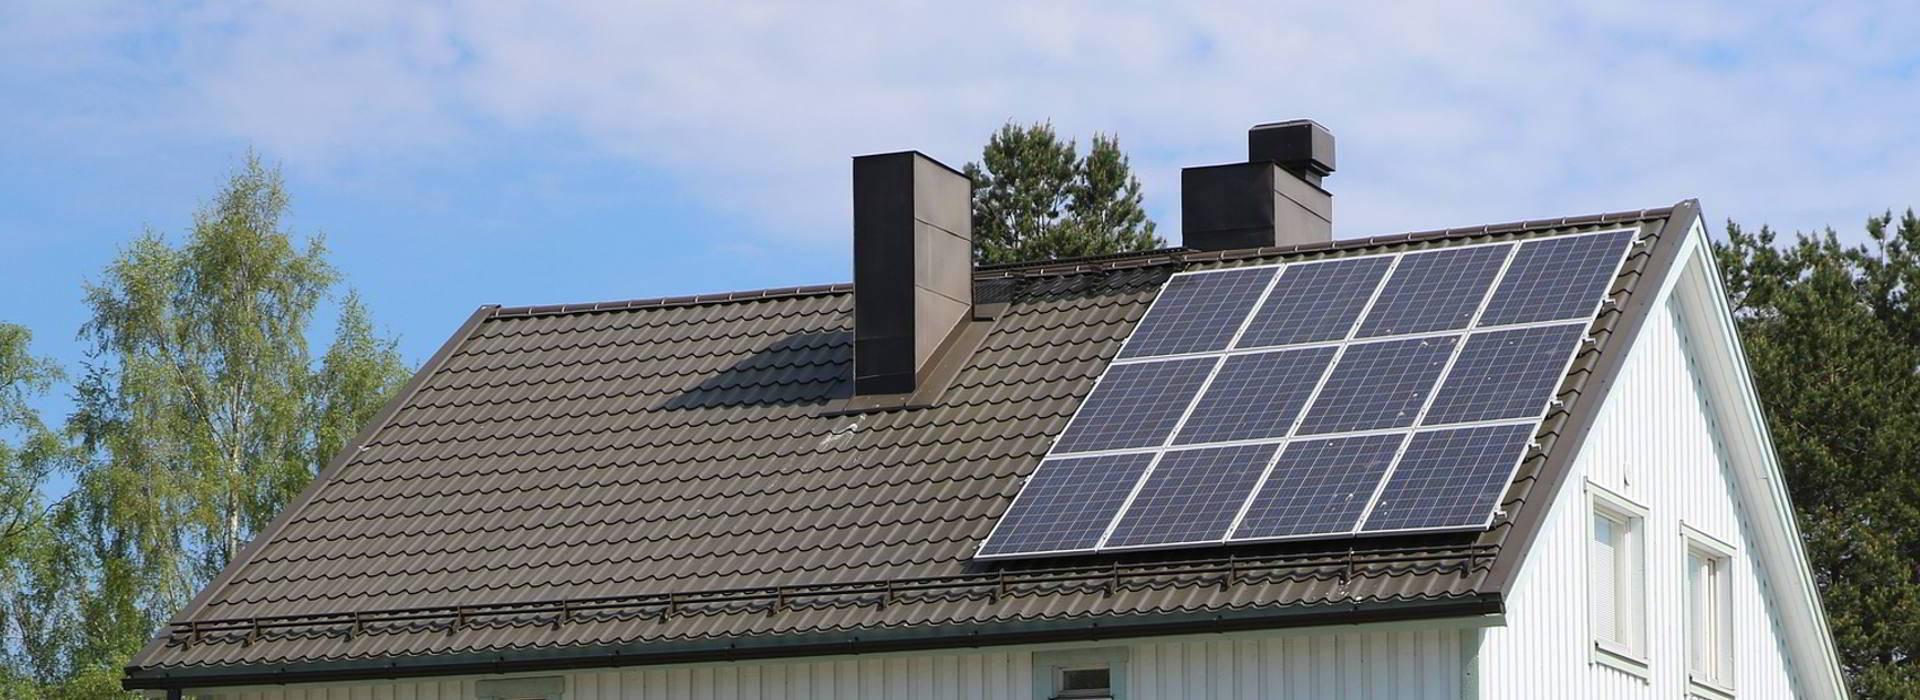 casa panel solar